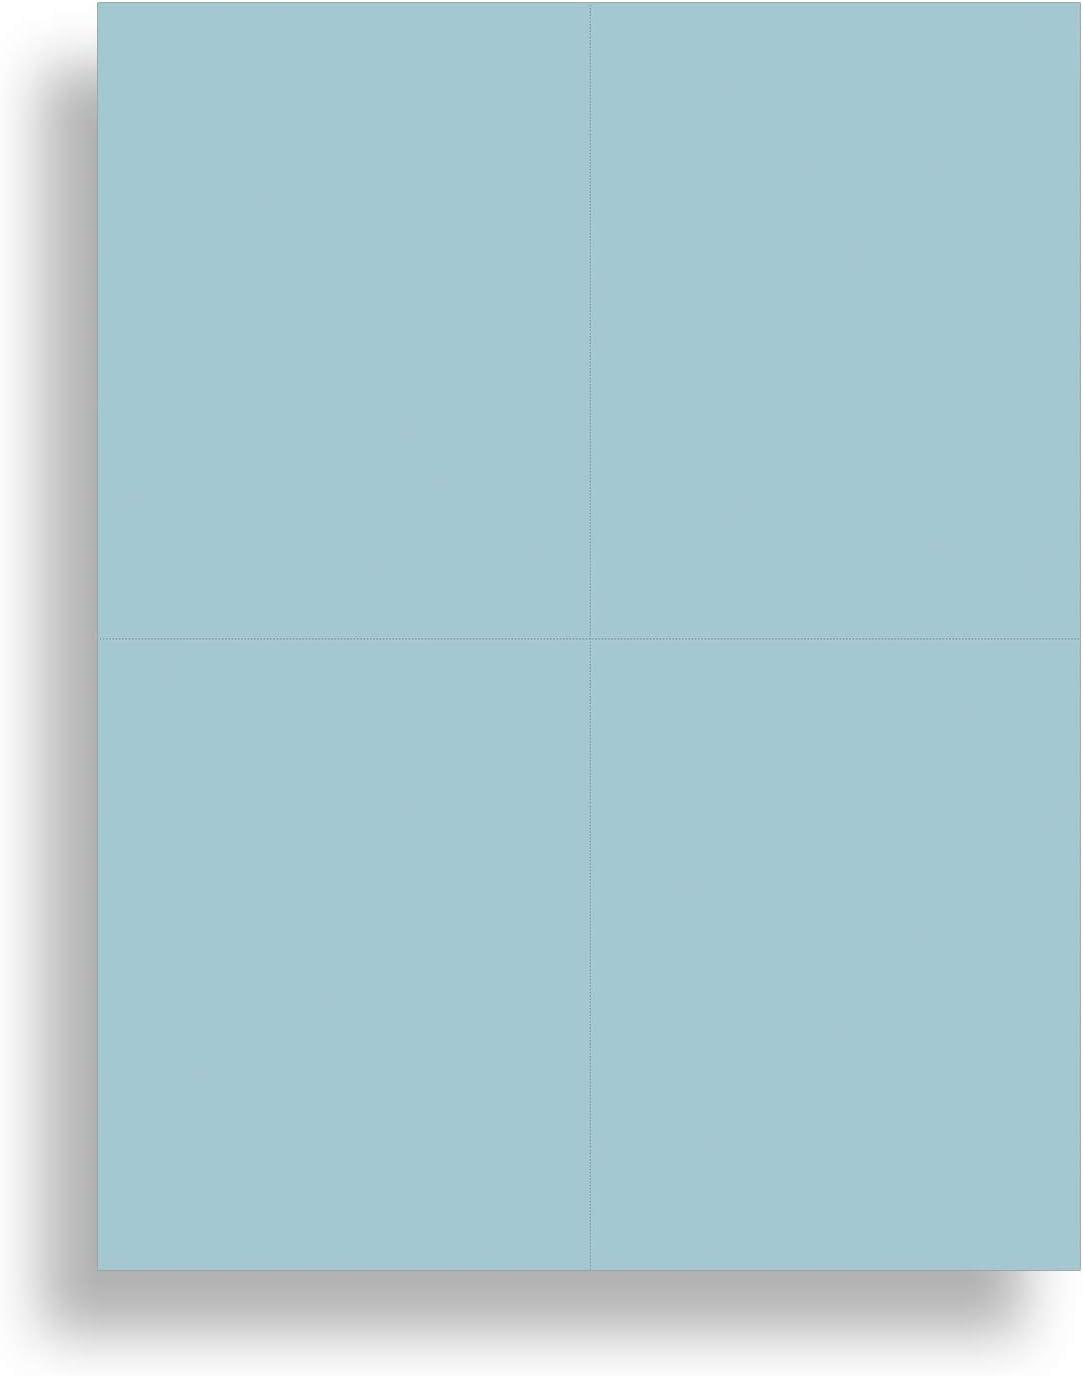 Blank Colored 4-up Postcard Paper by Desktop Publishing Supplies - 25 Sheets / 100 Postcards Pack - Printable with Laser or Inkjet Printer - Plain Matte Cardstock (Plain Blue)